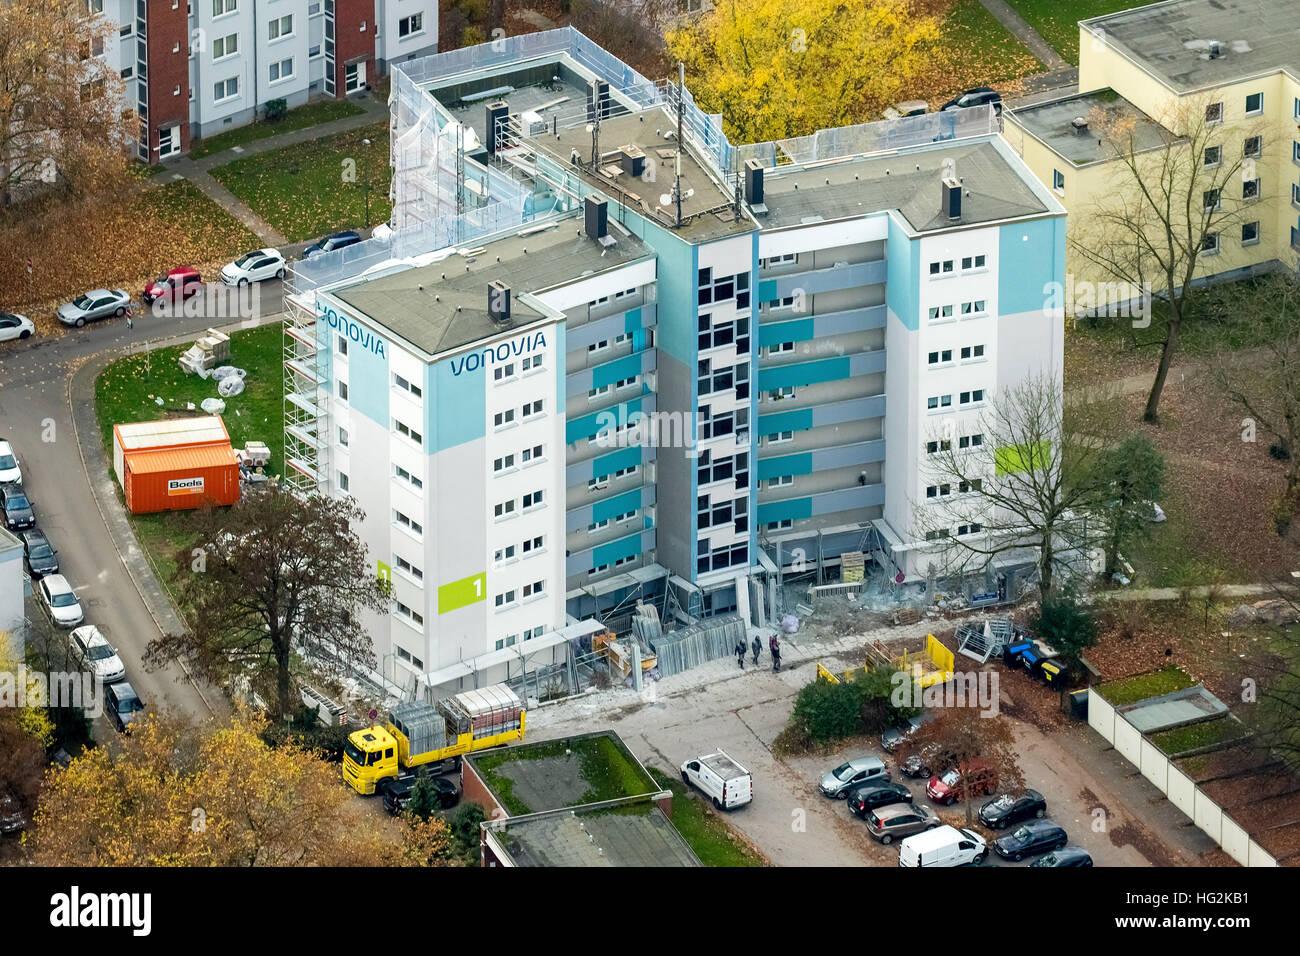 Aerial view, renovations VONOVIA skyscraper and settlement Narcissus Road, social housing, rental housing, Bochum, Stock Photo